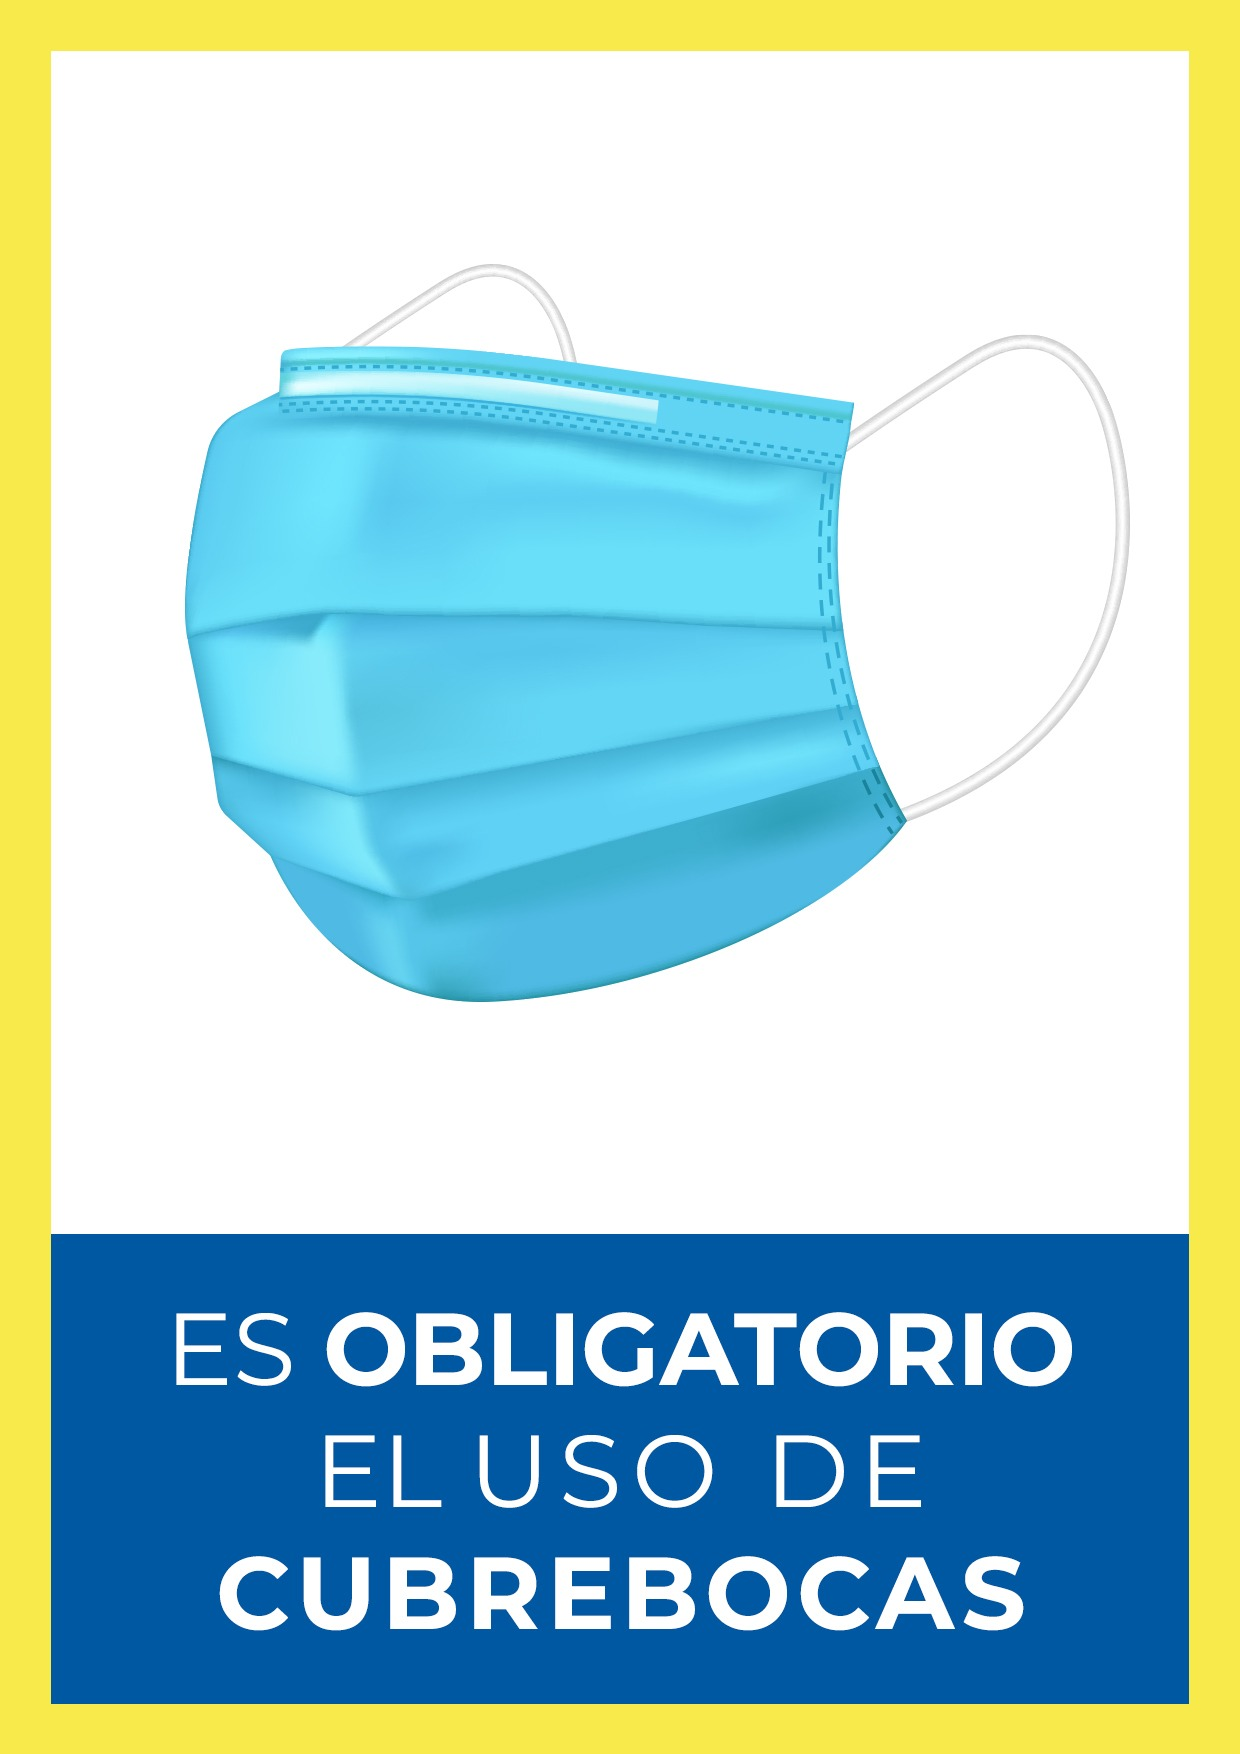 letrero para uso obligatorio de cubrebocas para imprimir gratis